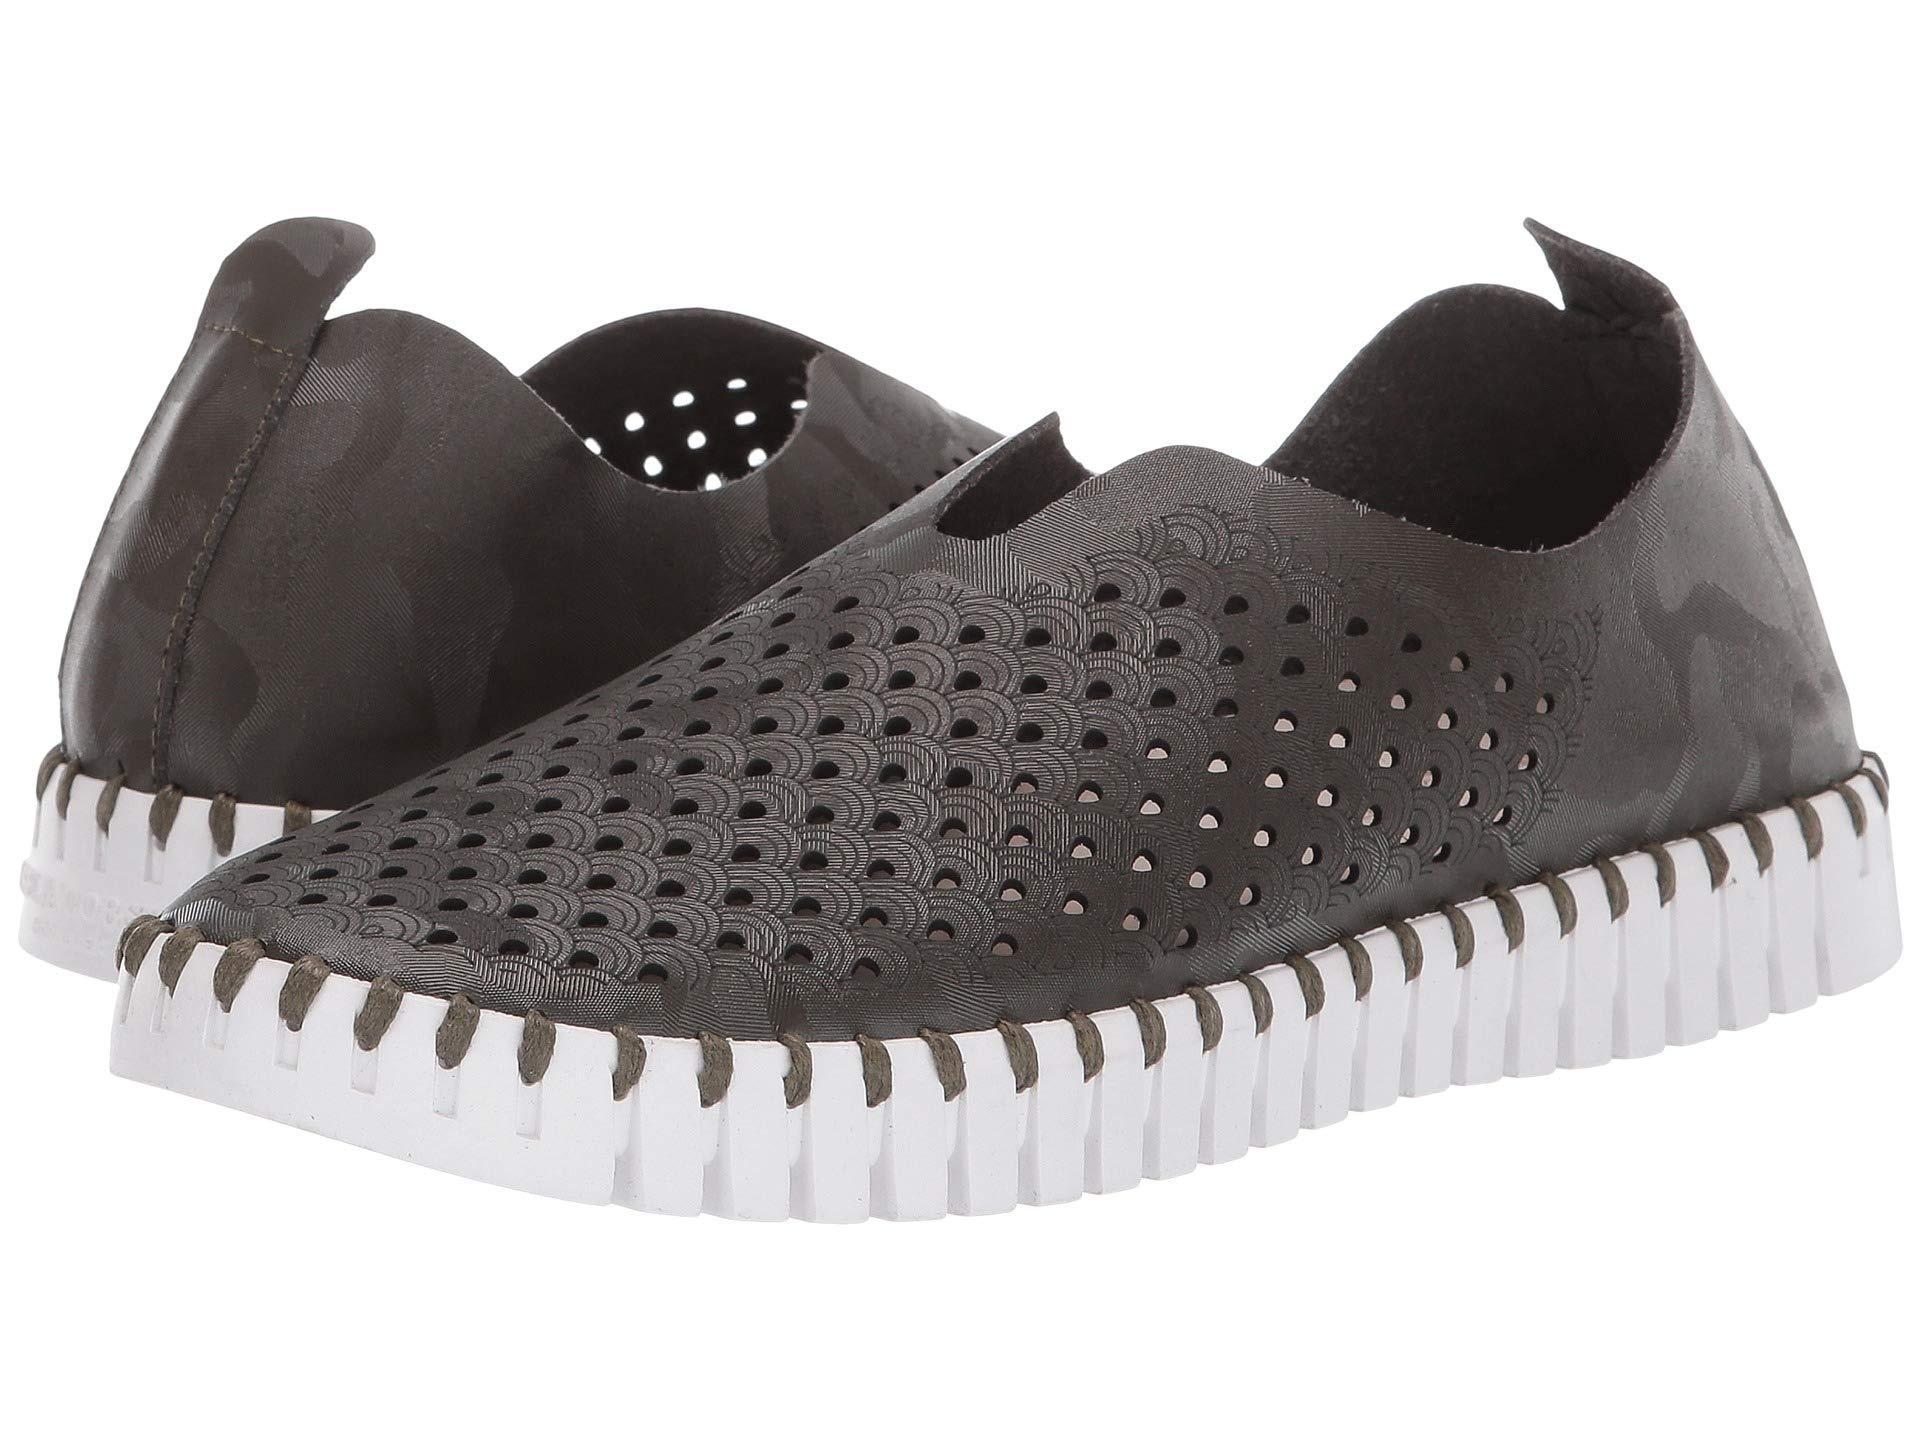 438d74f17628 Lyst - Ilse Jacobsen Tulip 3565 (sand Pile) Women s Slip On Shoes